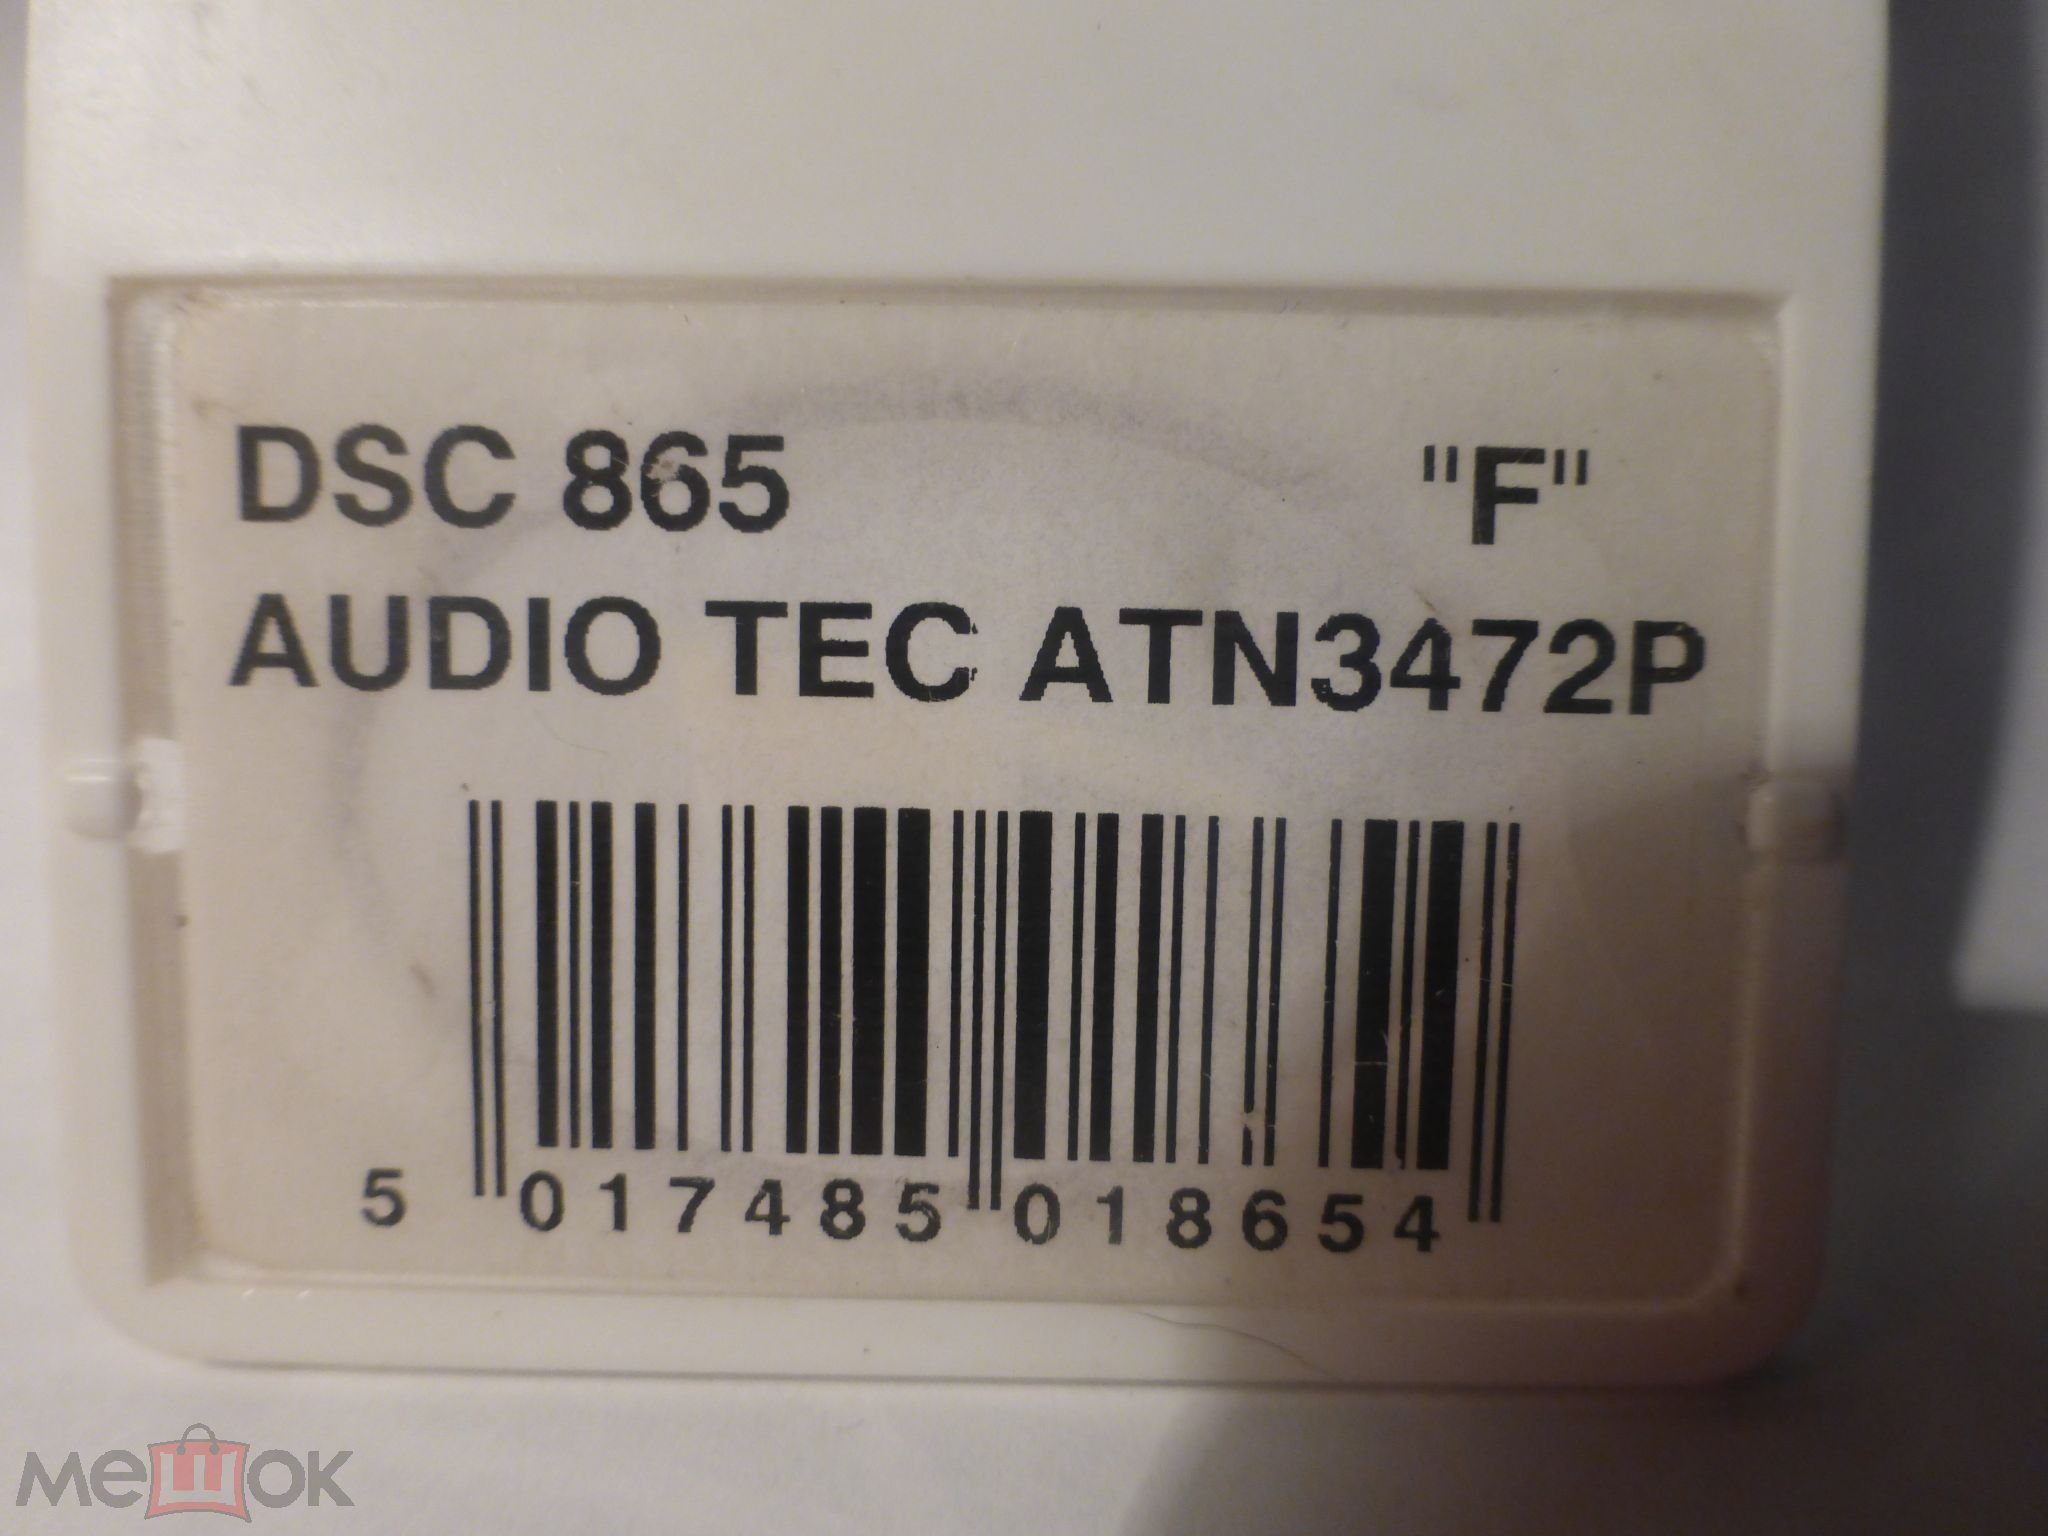 Audio-technica ATN 3472 P VICTOR JVC DT 45